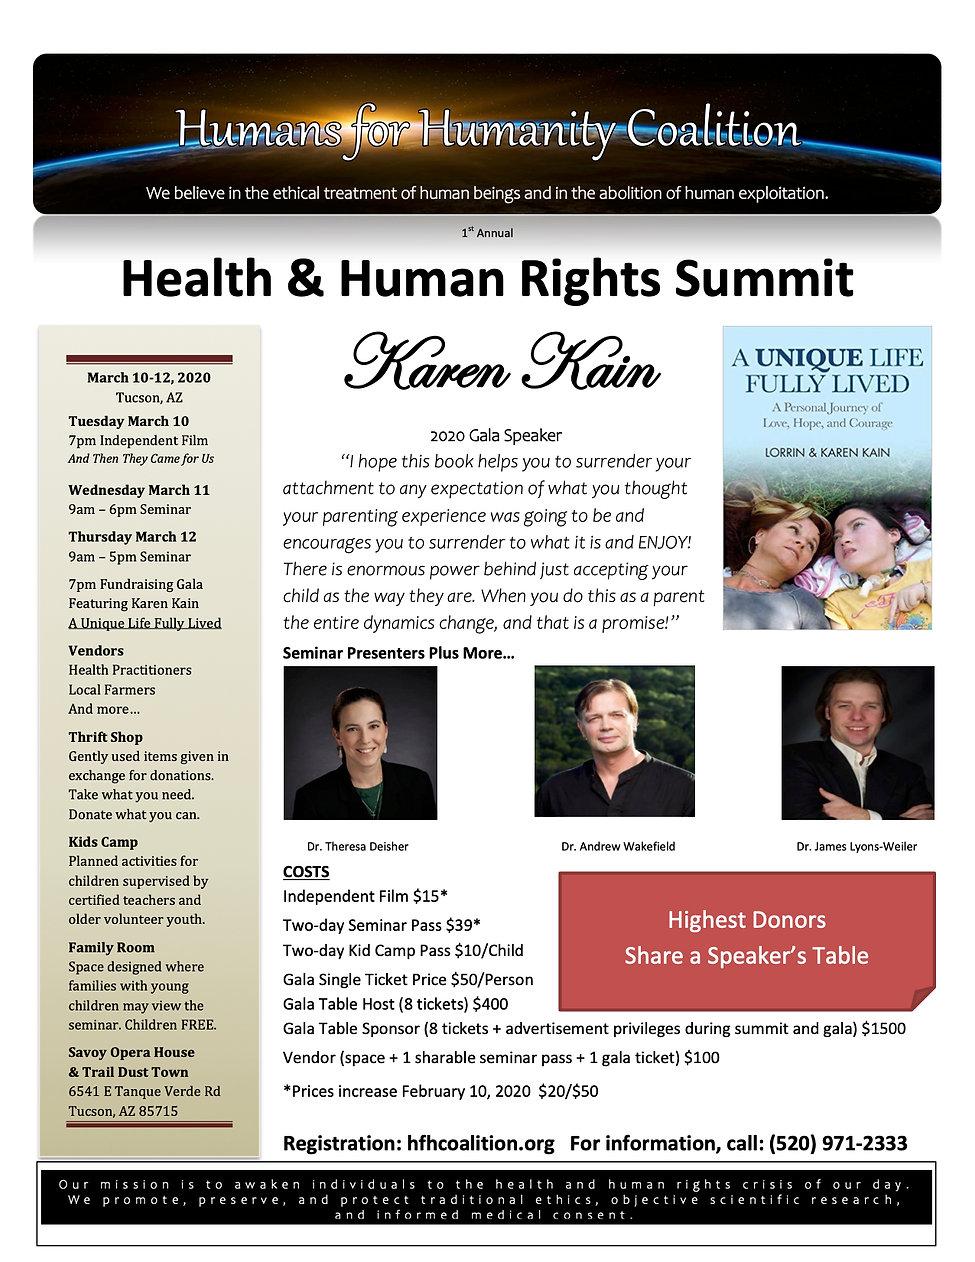 Health & Human Rights Summit Flyer_2.jpg